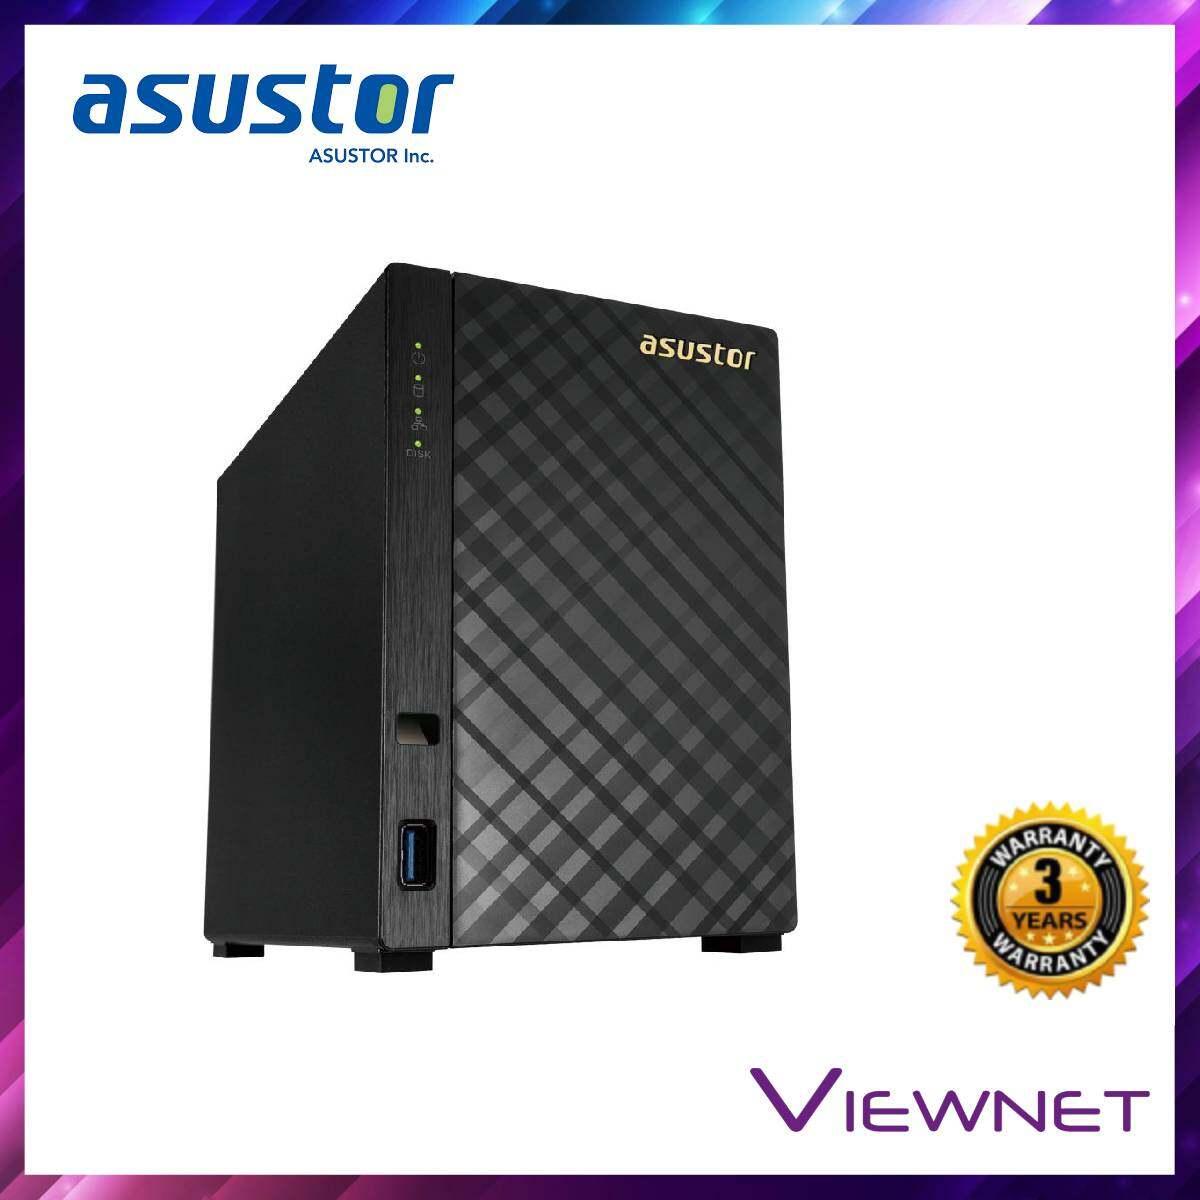 Asustor Enclosure 2-BAYS/Intel Celeron DC 1.6GHz/2GB DDR3L/2*1GBE LAN/HDMI/EXPANDABLE-14U NAS (AS3102T V2)